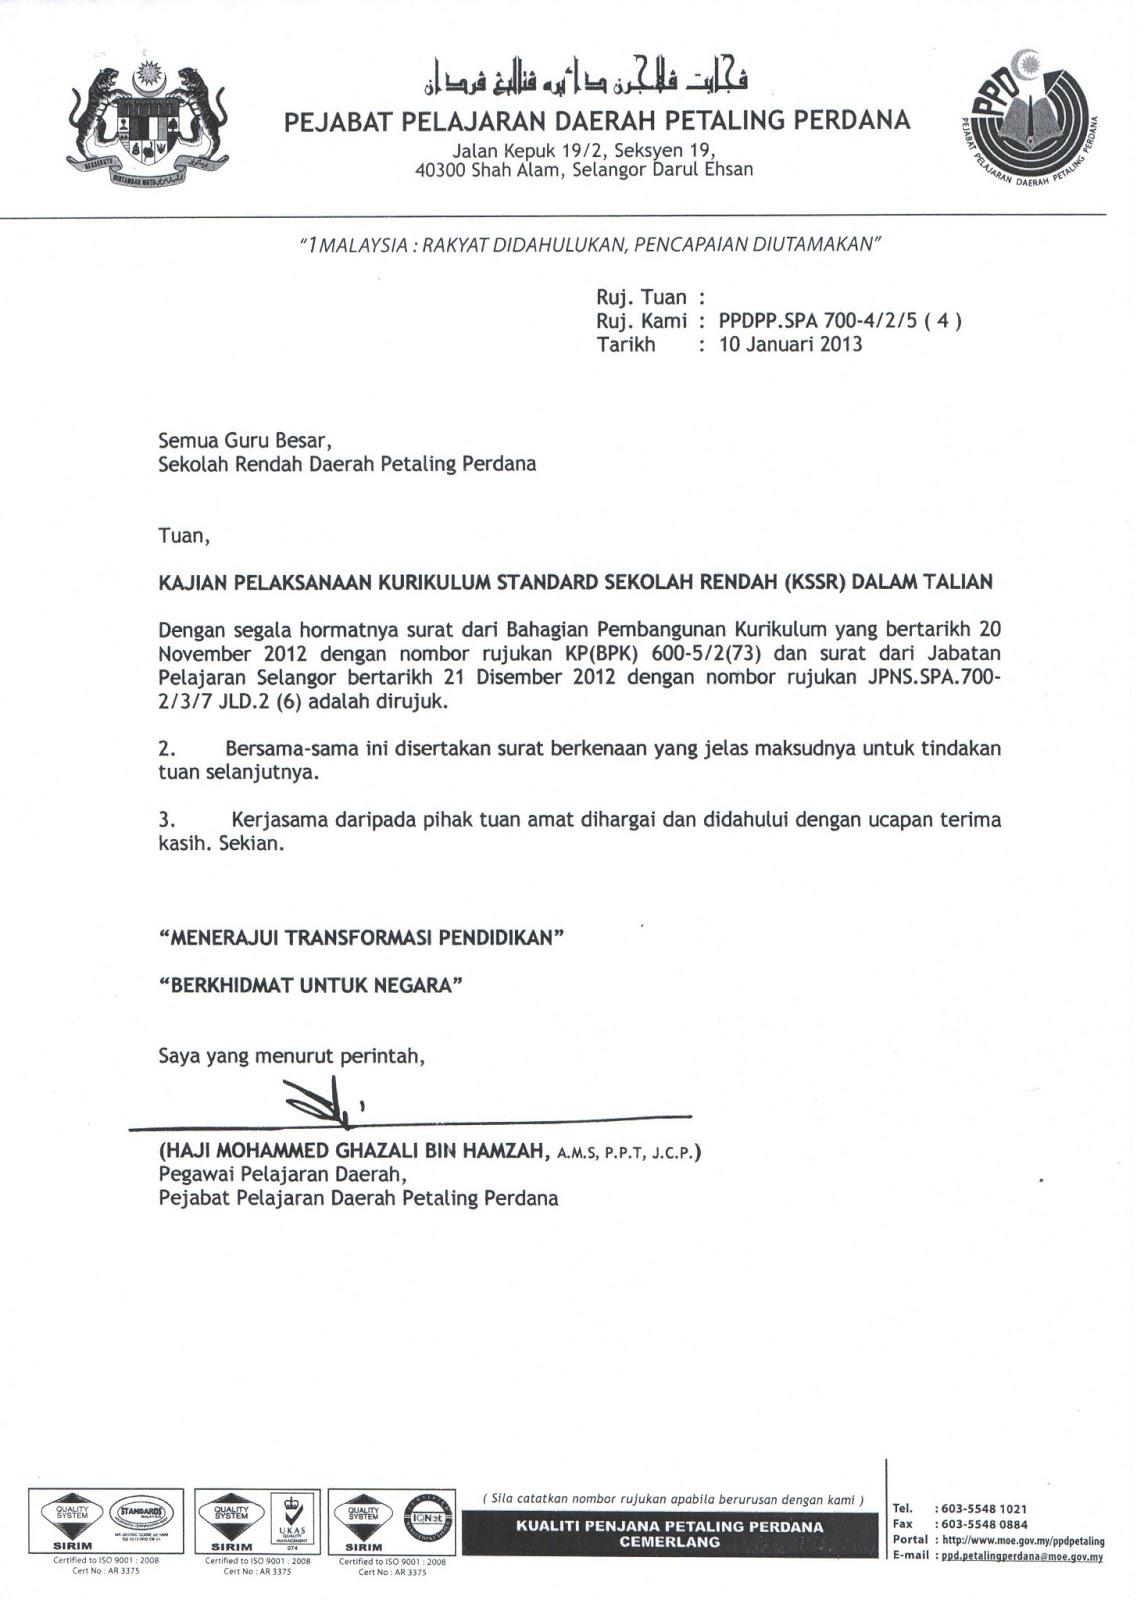 Format Surat Rasmi Kerajaan 2013 Surat Rasmi F